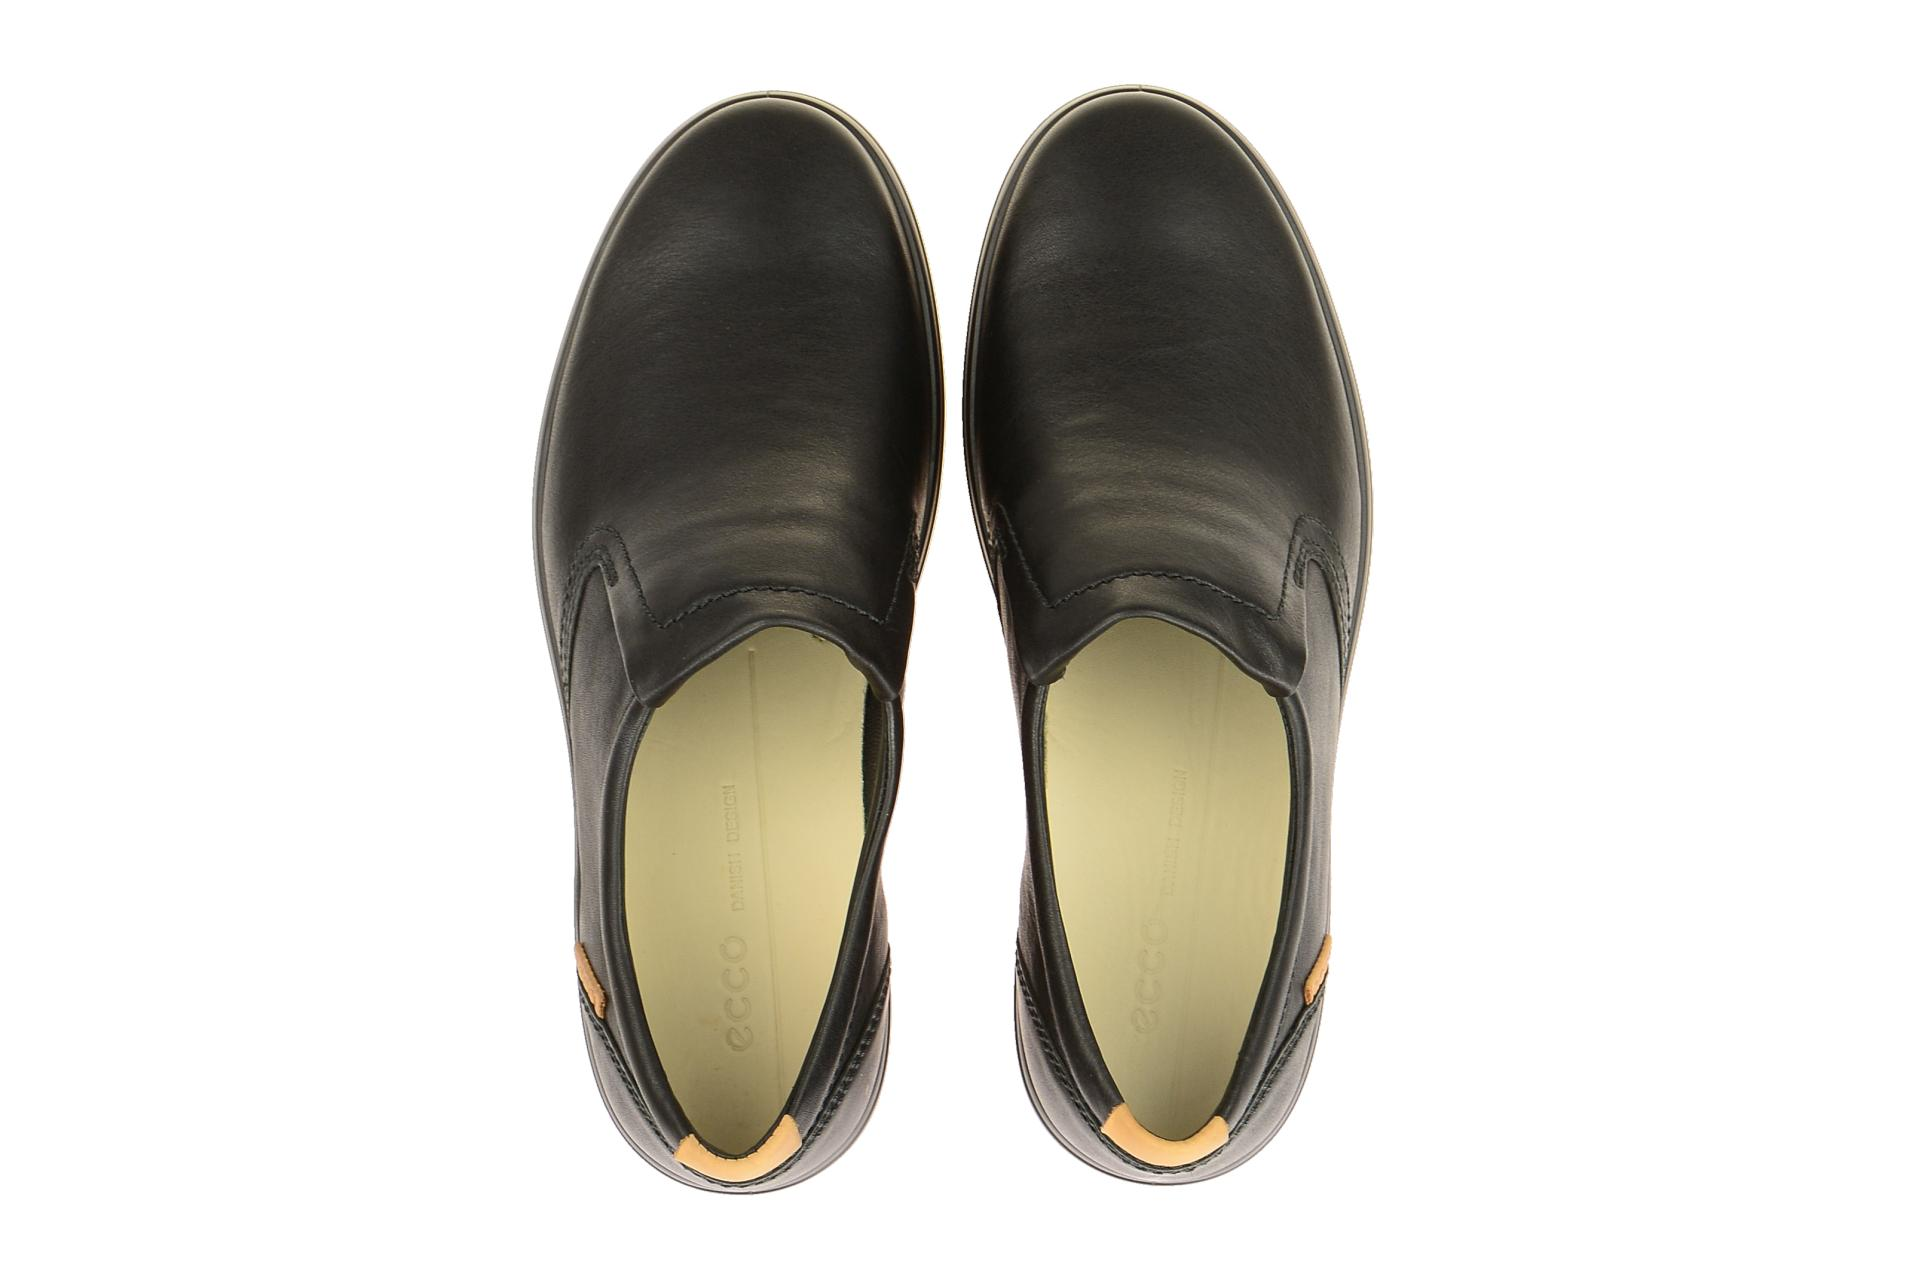 Herrenschuhe Ecco Sneaker schwarz SOFT 7 MENS 43036421001